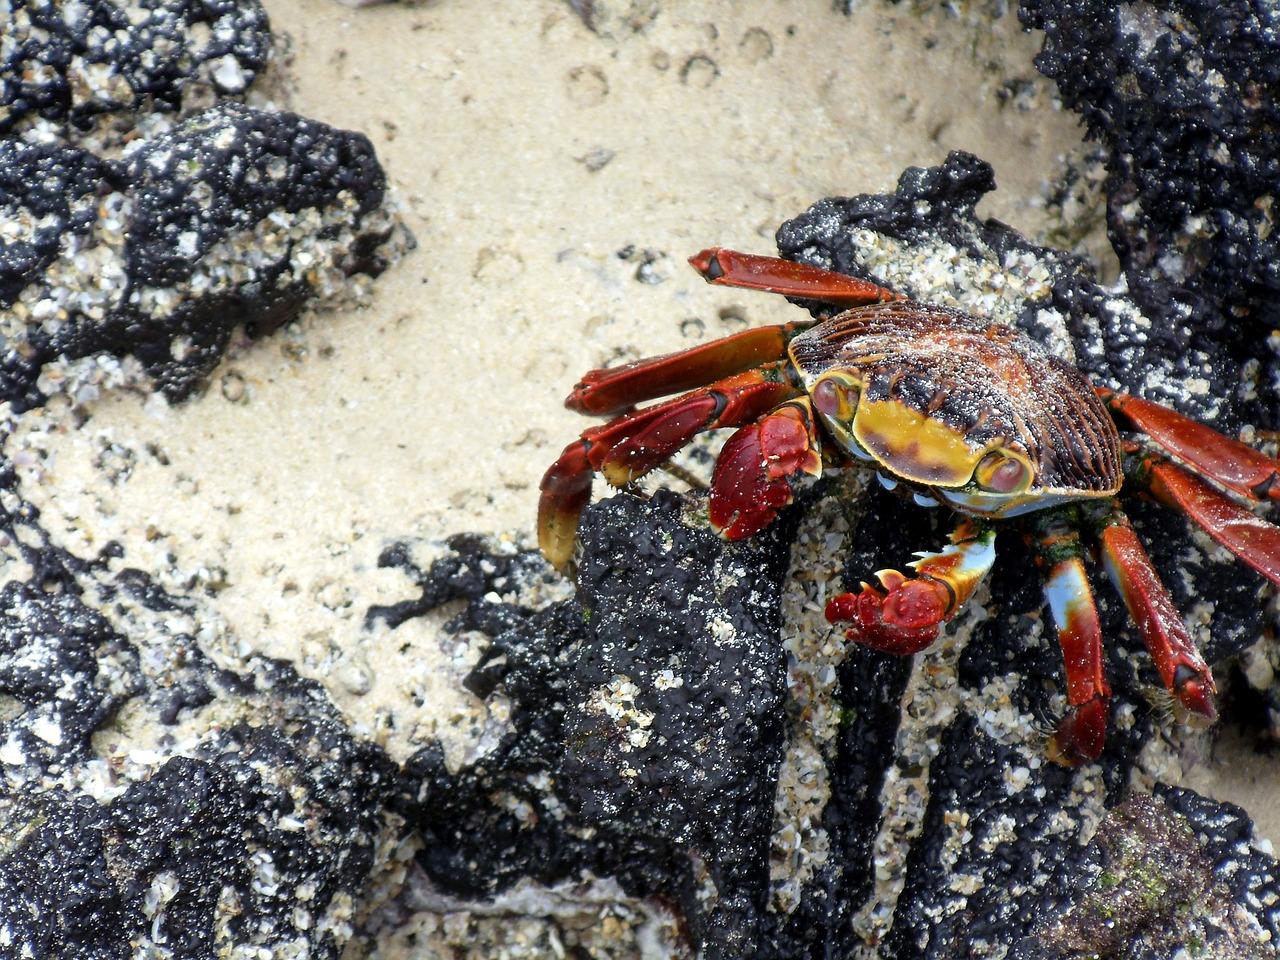 crab-164857_1280.jpg